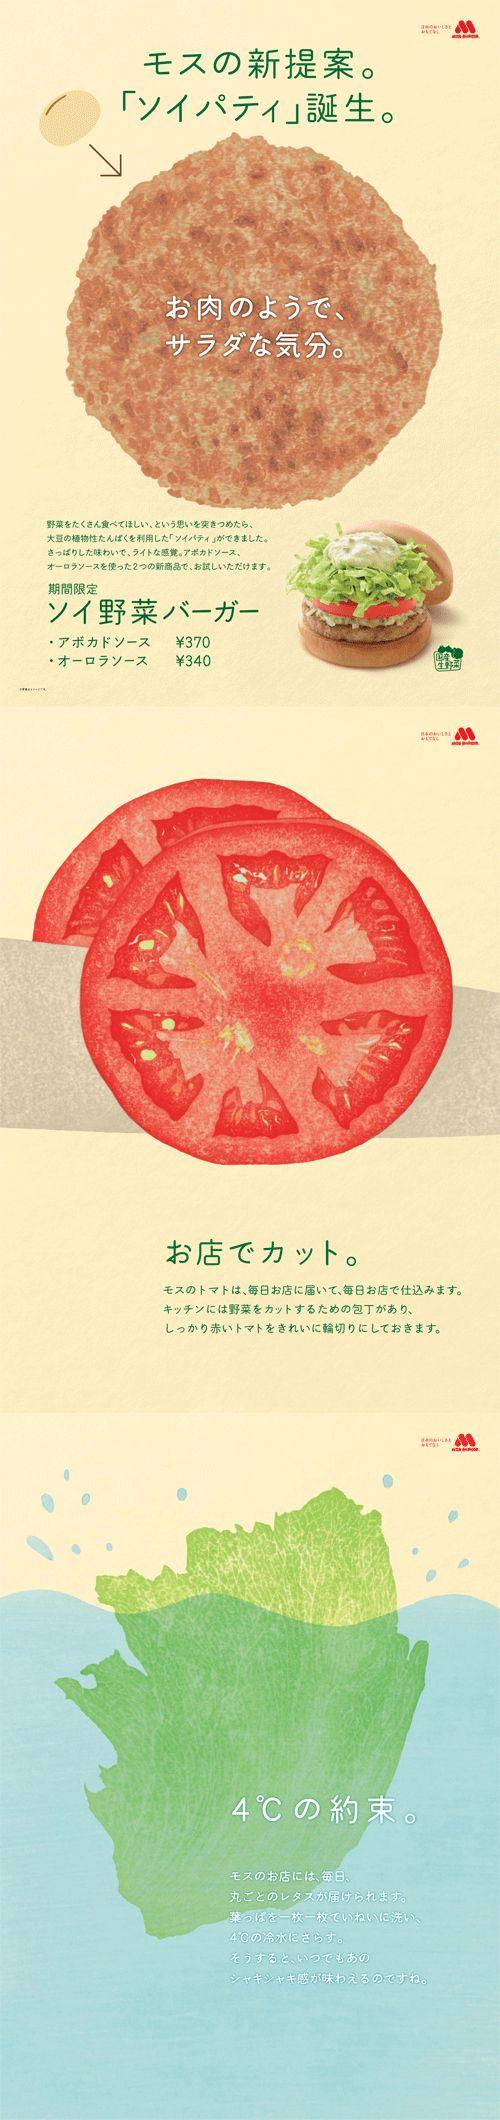 158 Best 日本 Japan ジャパン Images On Pinterest Design